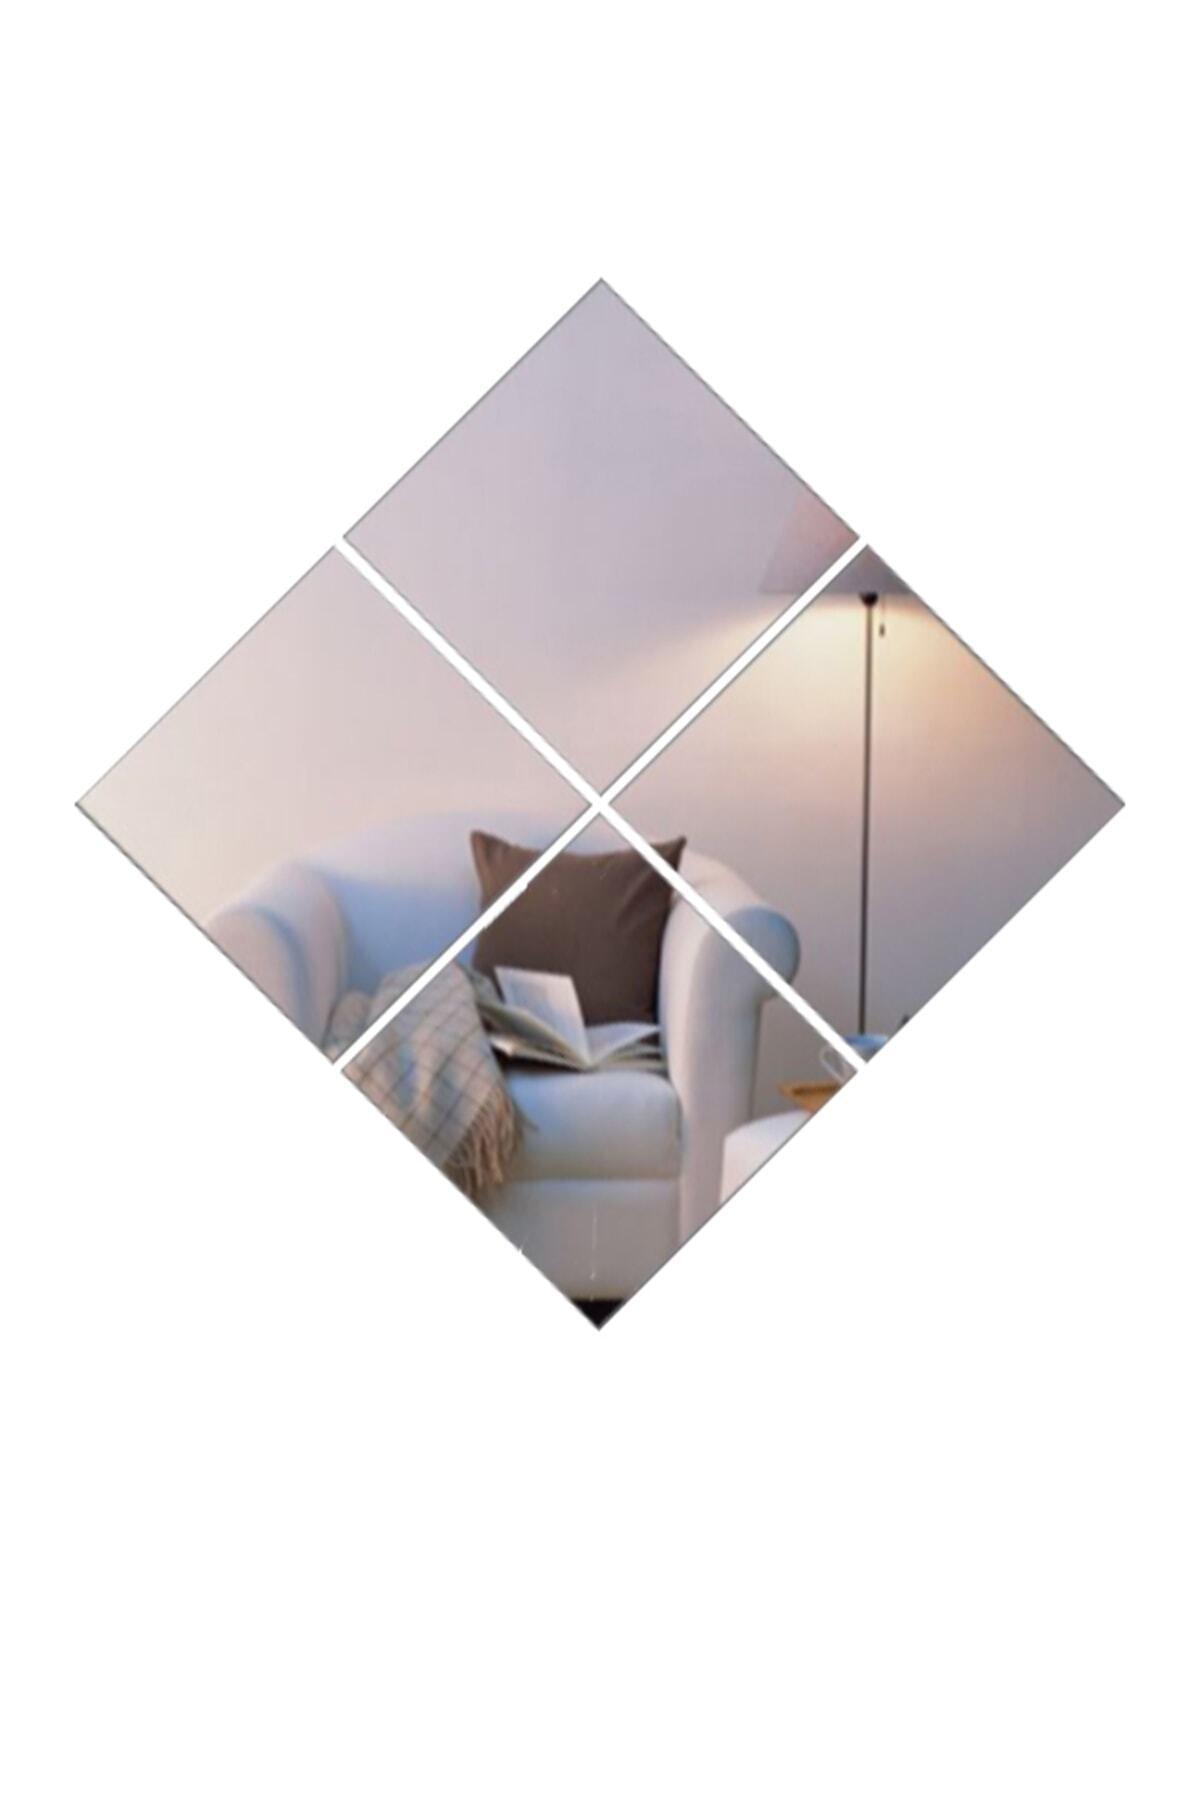 Home 4'lü Dekoratif Ayna (20x20)